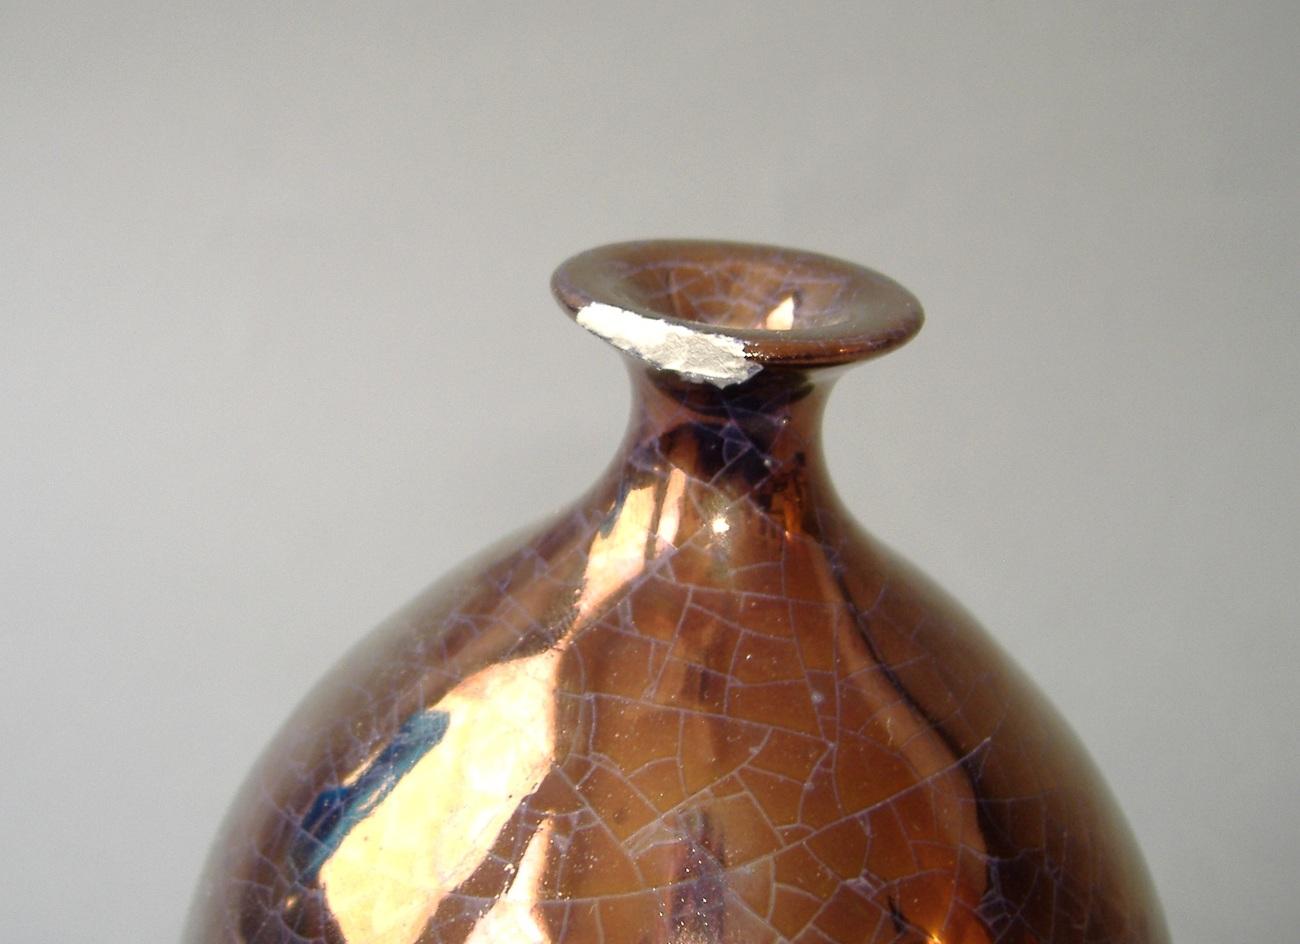 Copper Crackle Ceramic Porcelain Art Pottery Round Vase Handcrafted Decor Second